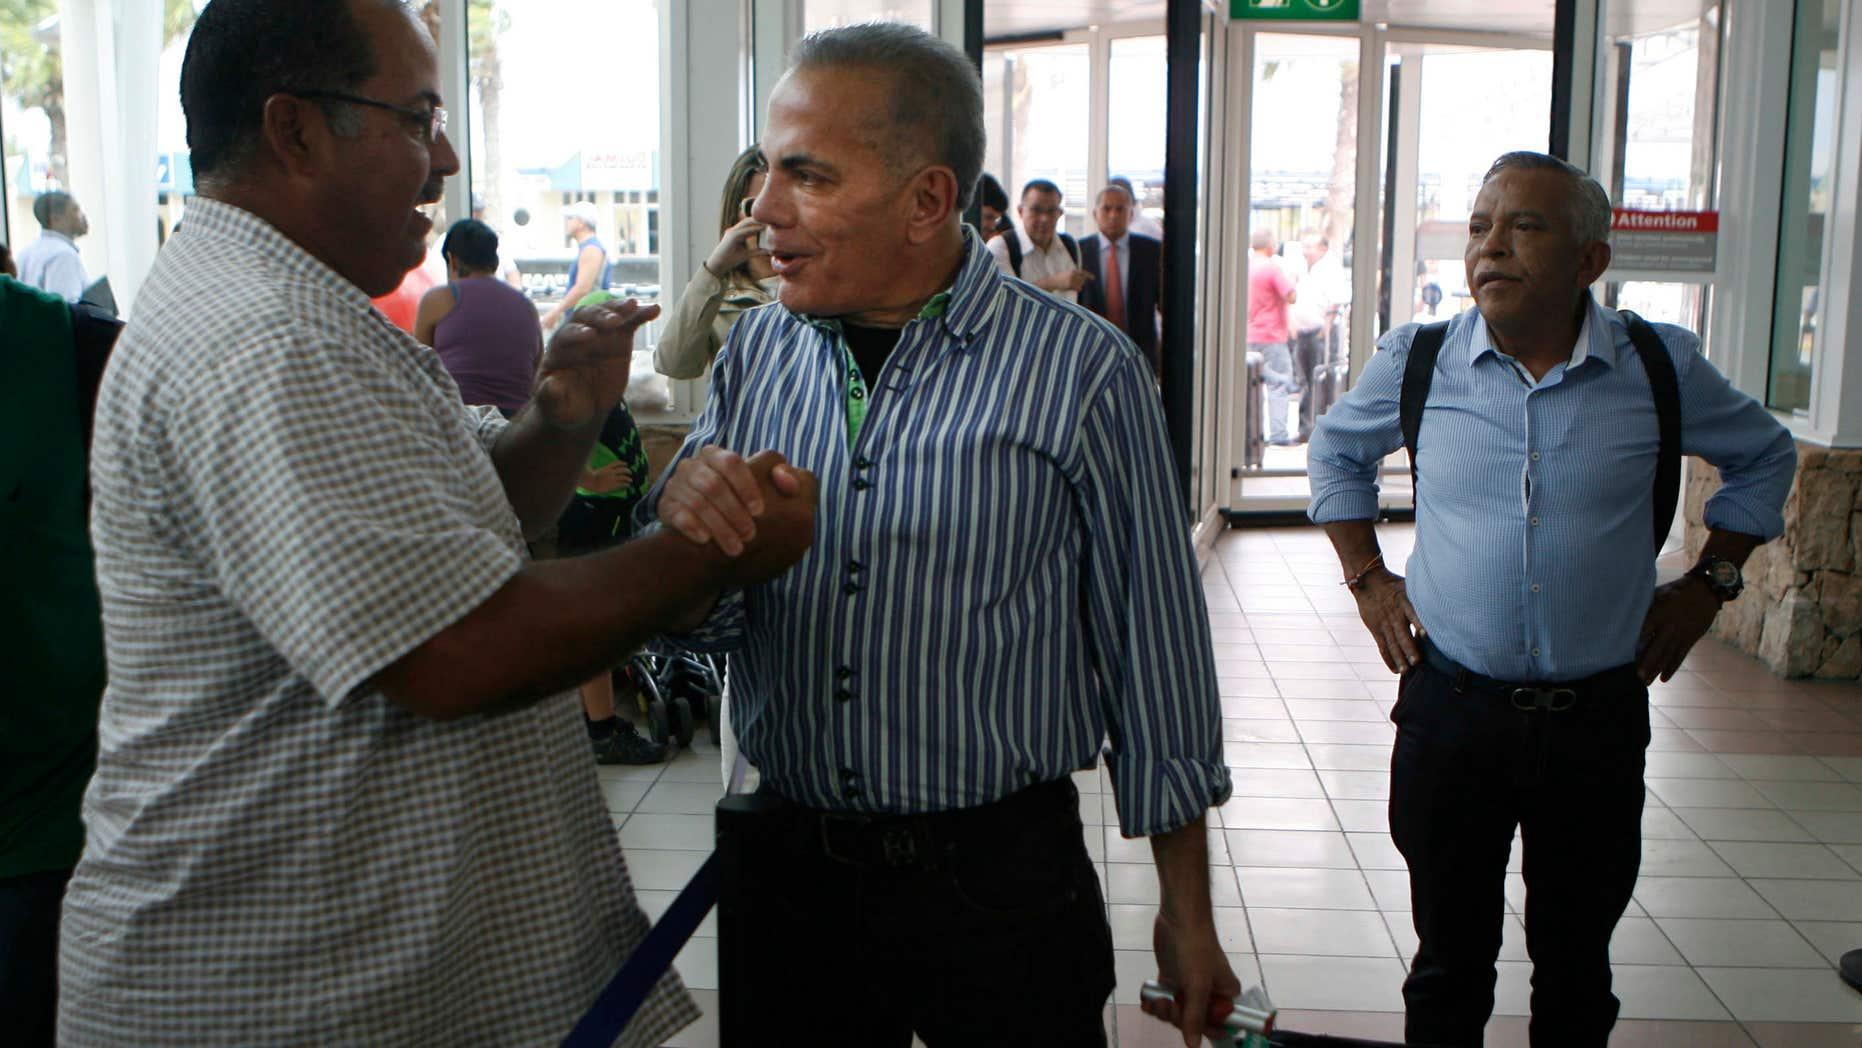 Oct. 15, 2015: A unidentified man shake hands with Venezuelan opposition leader Manuel Rosales, center, before he flies to Venezuela, at the airport near Oranjestad, Aruba.